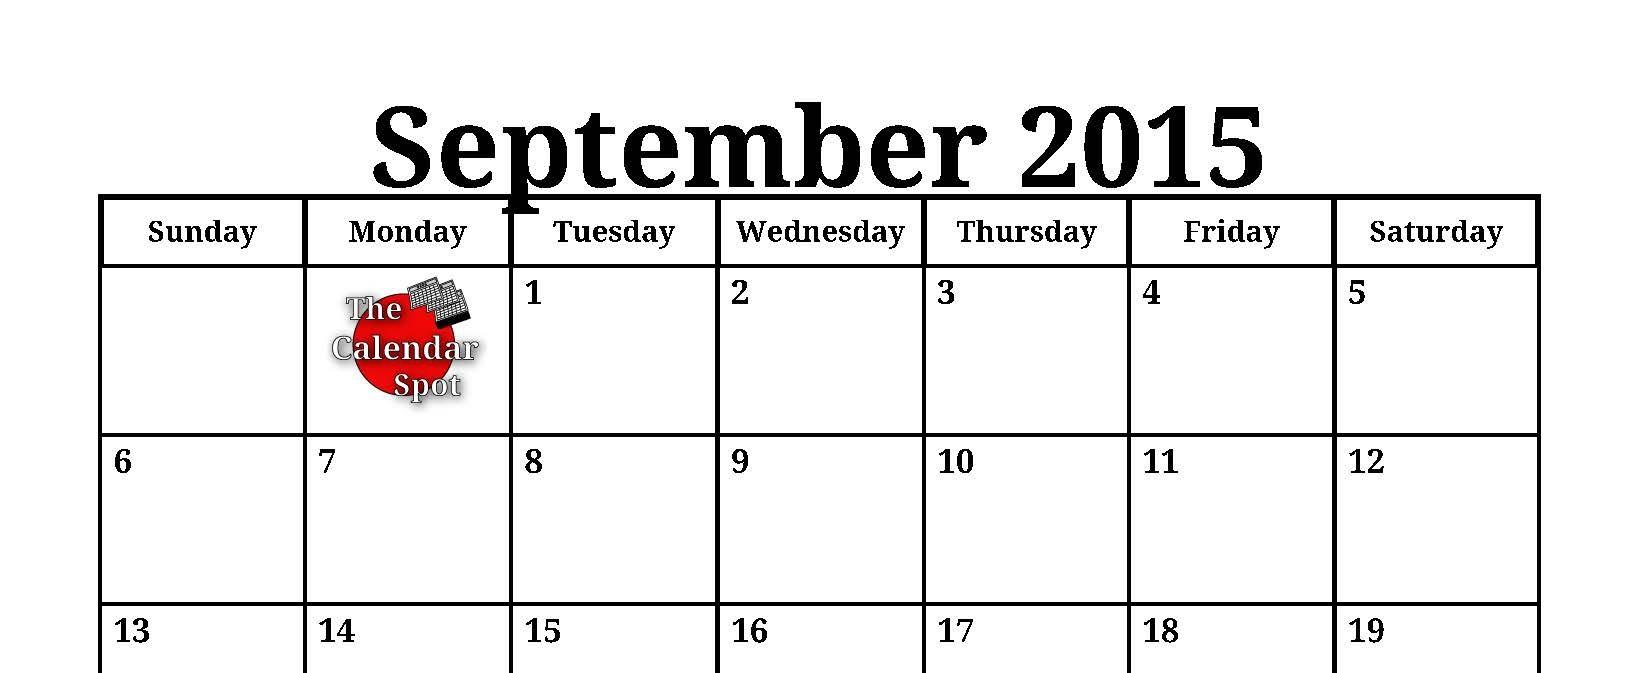 10 Best Images Of September 2015 Calendar Template Pdf September3abry